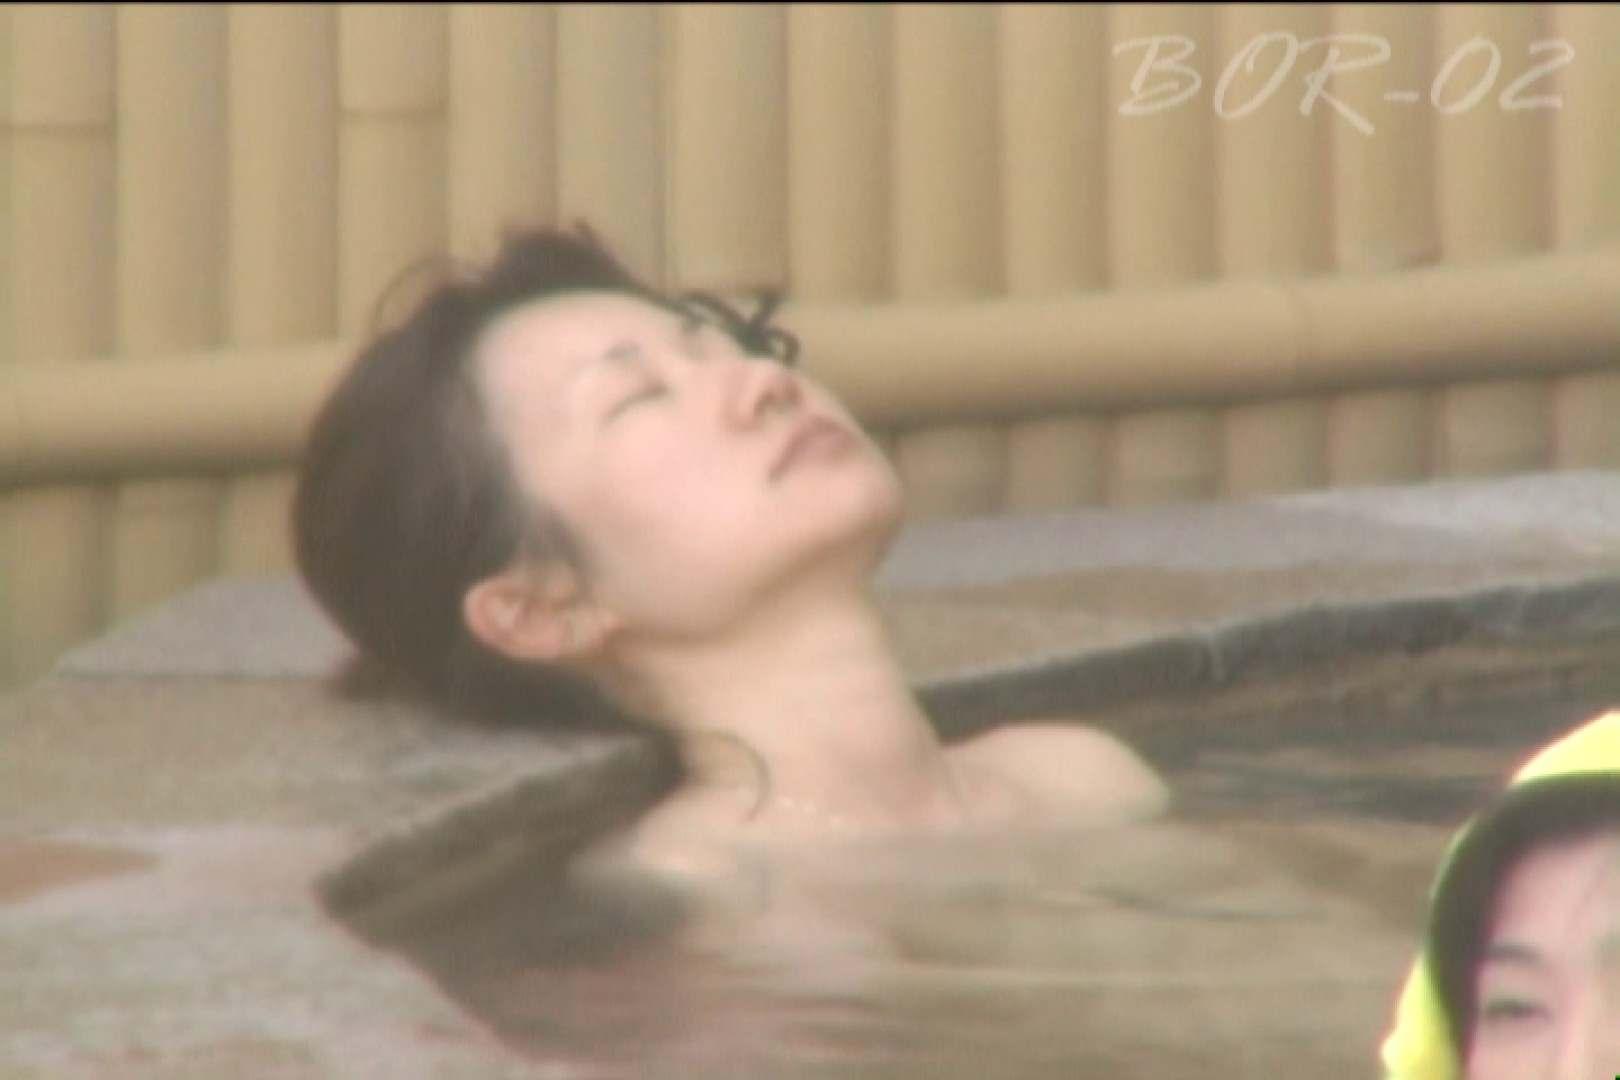 Aquaな露天風呂Vol.477 盗撮  79連発 30